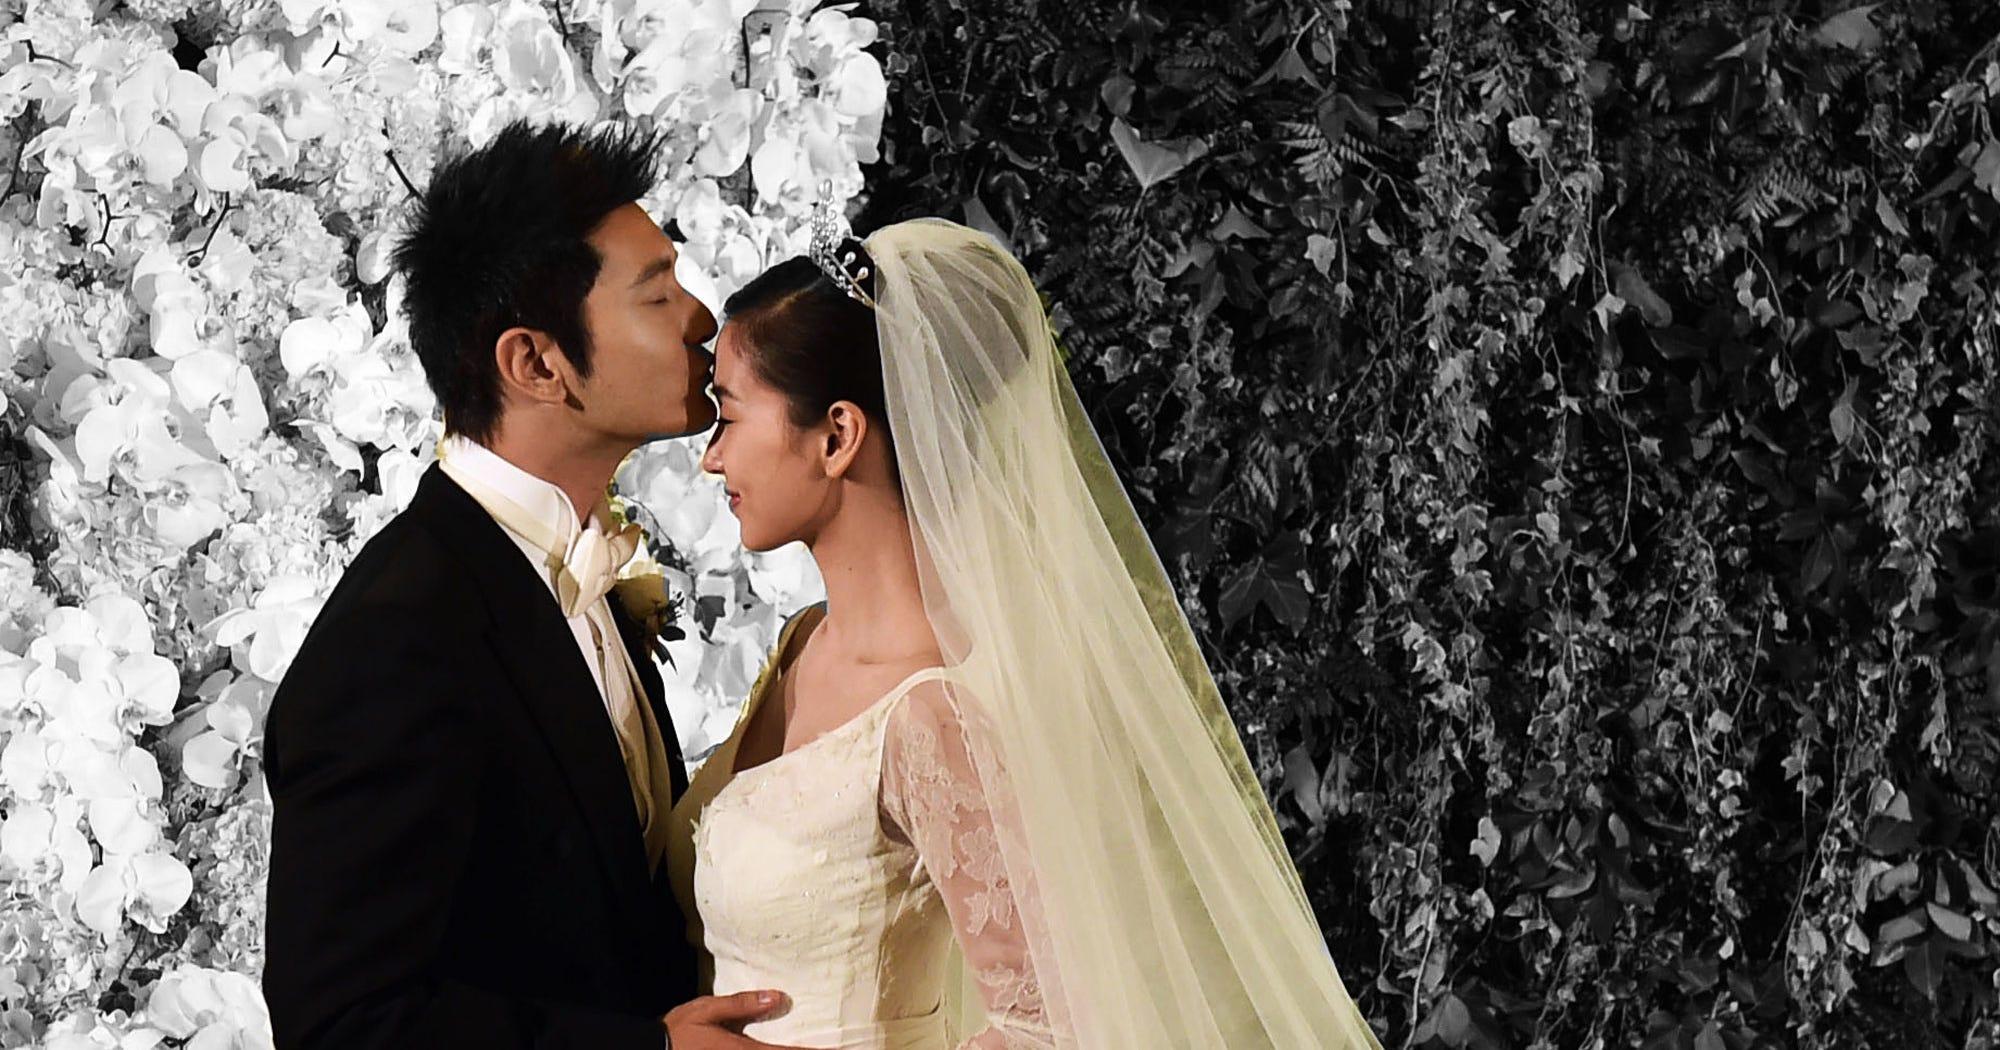 Angela Yeung Wedding Gift Bags : Angelababy Angela Yeung 31 Million Dollar China Wedding